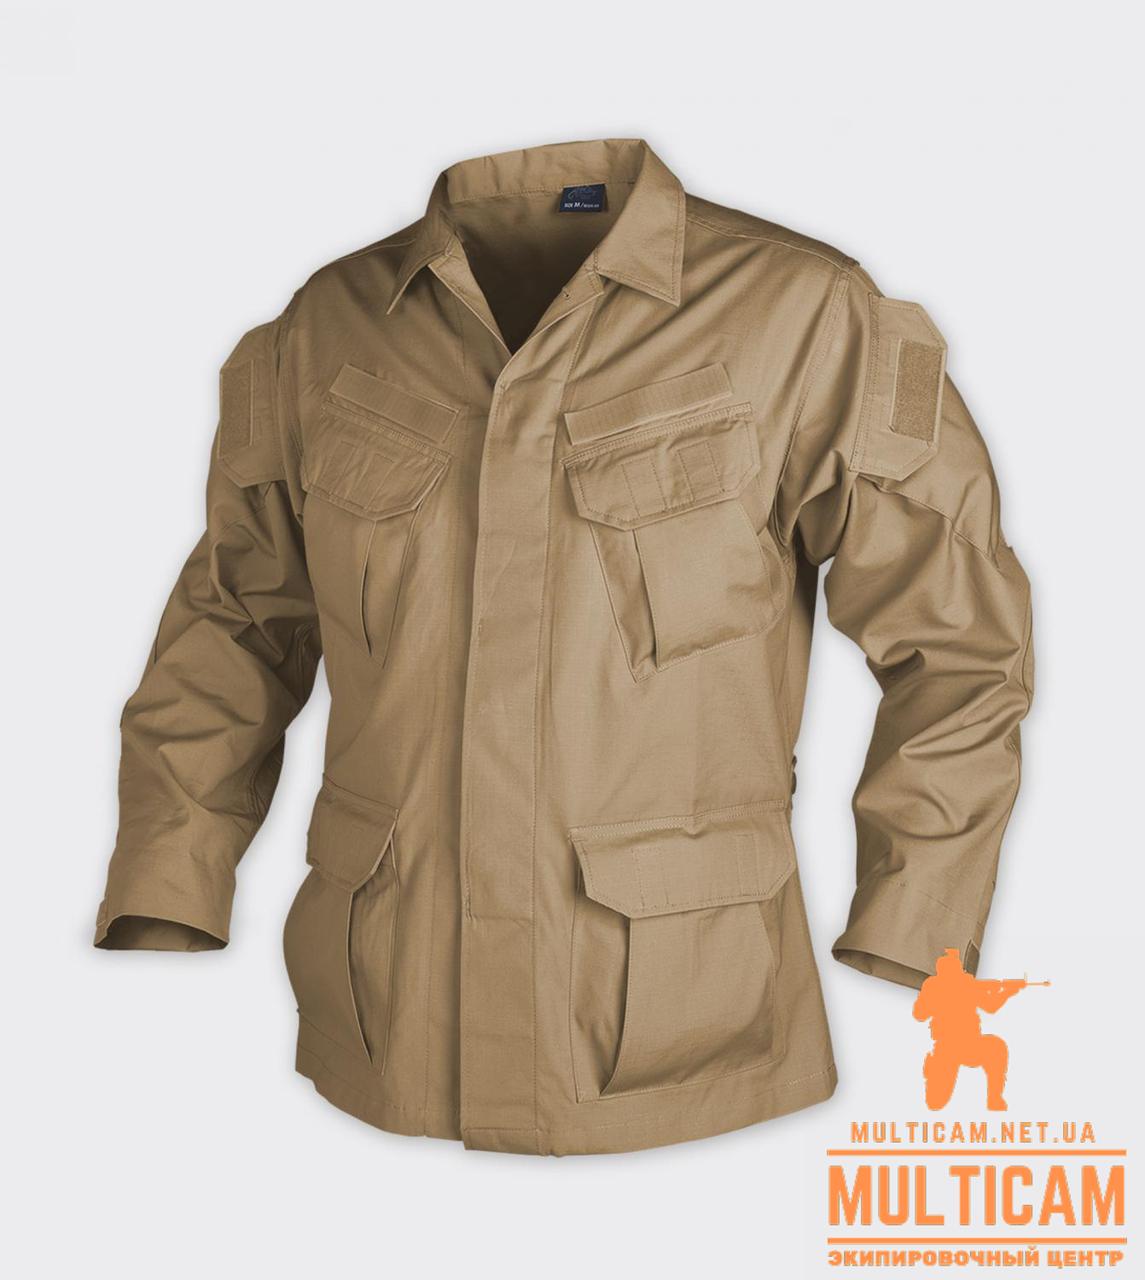 Кітель Helikon-Tex® SFU Shirt - PolyCotton Ripstop - Coyote